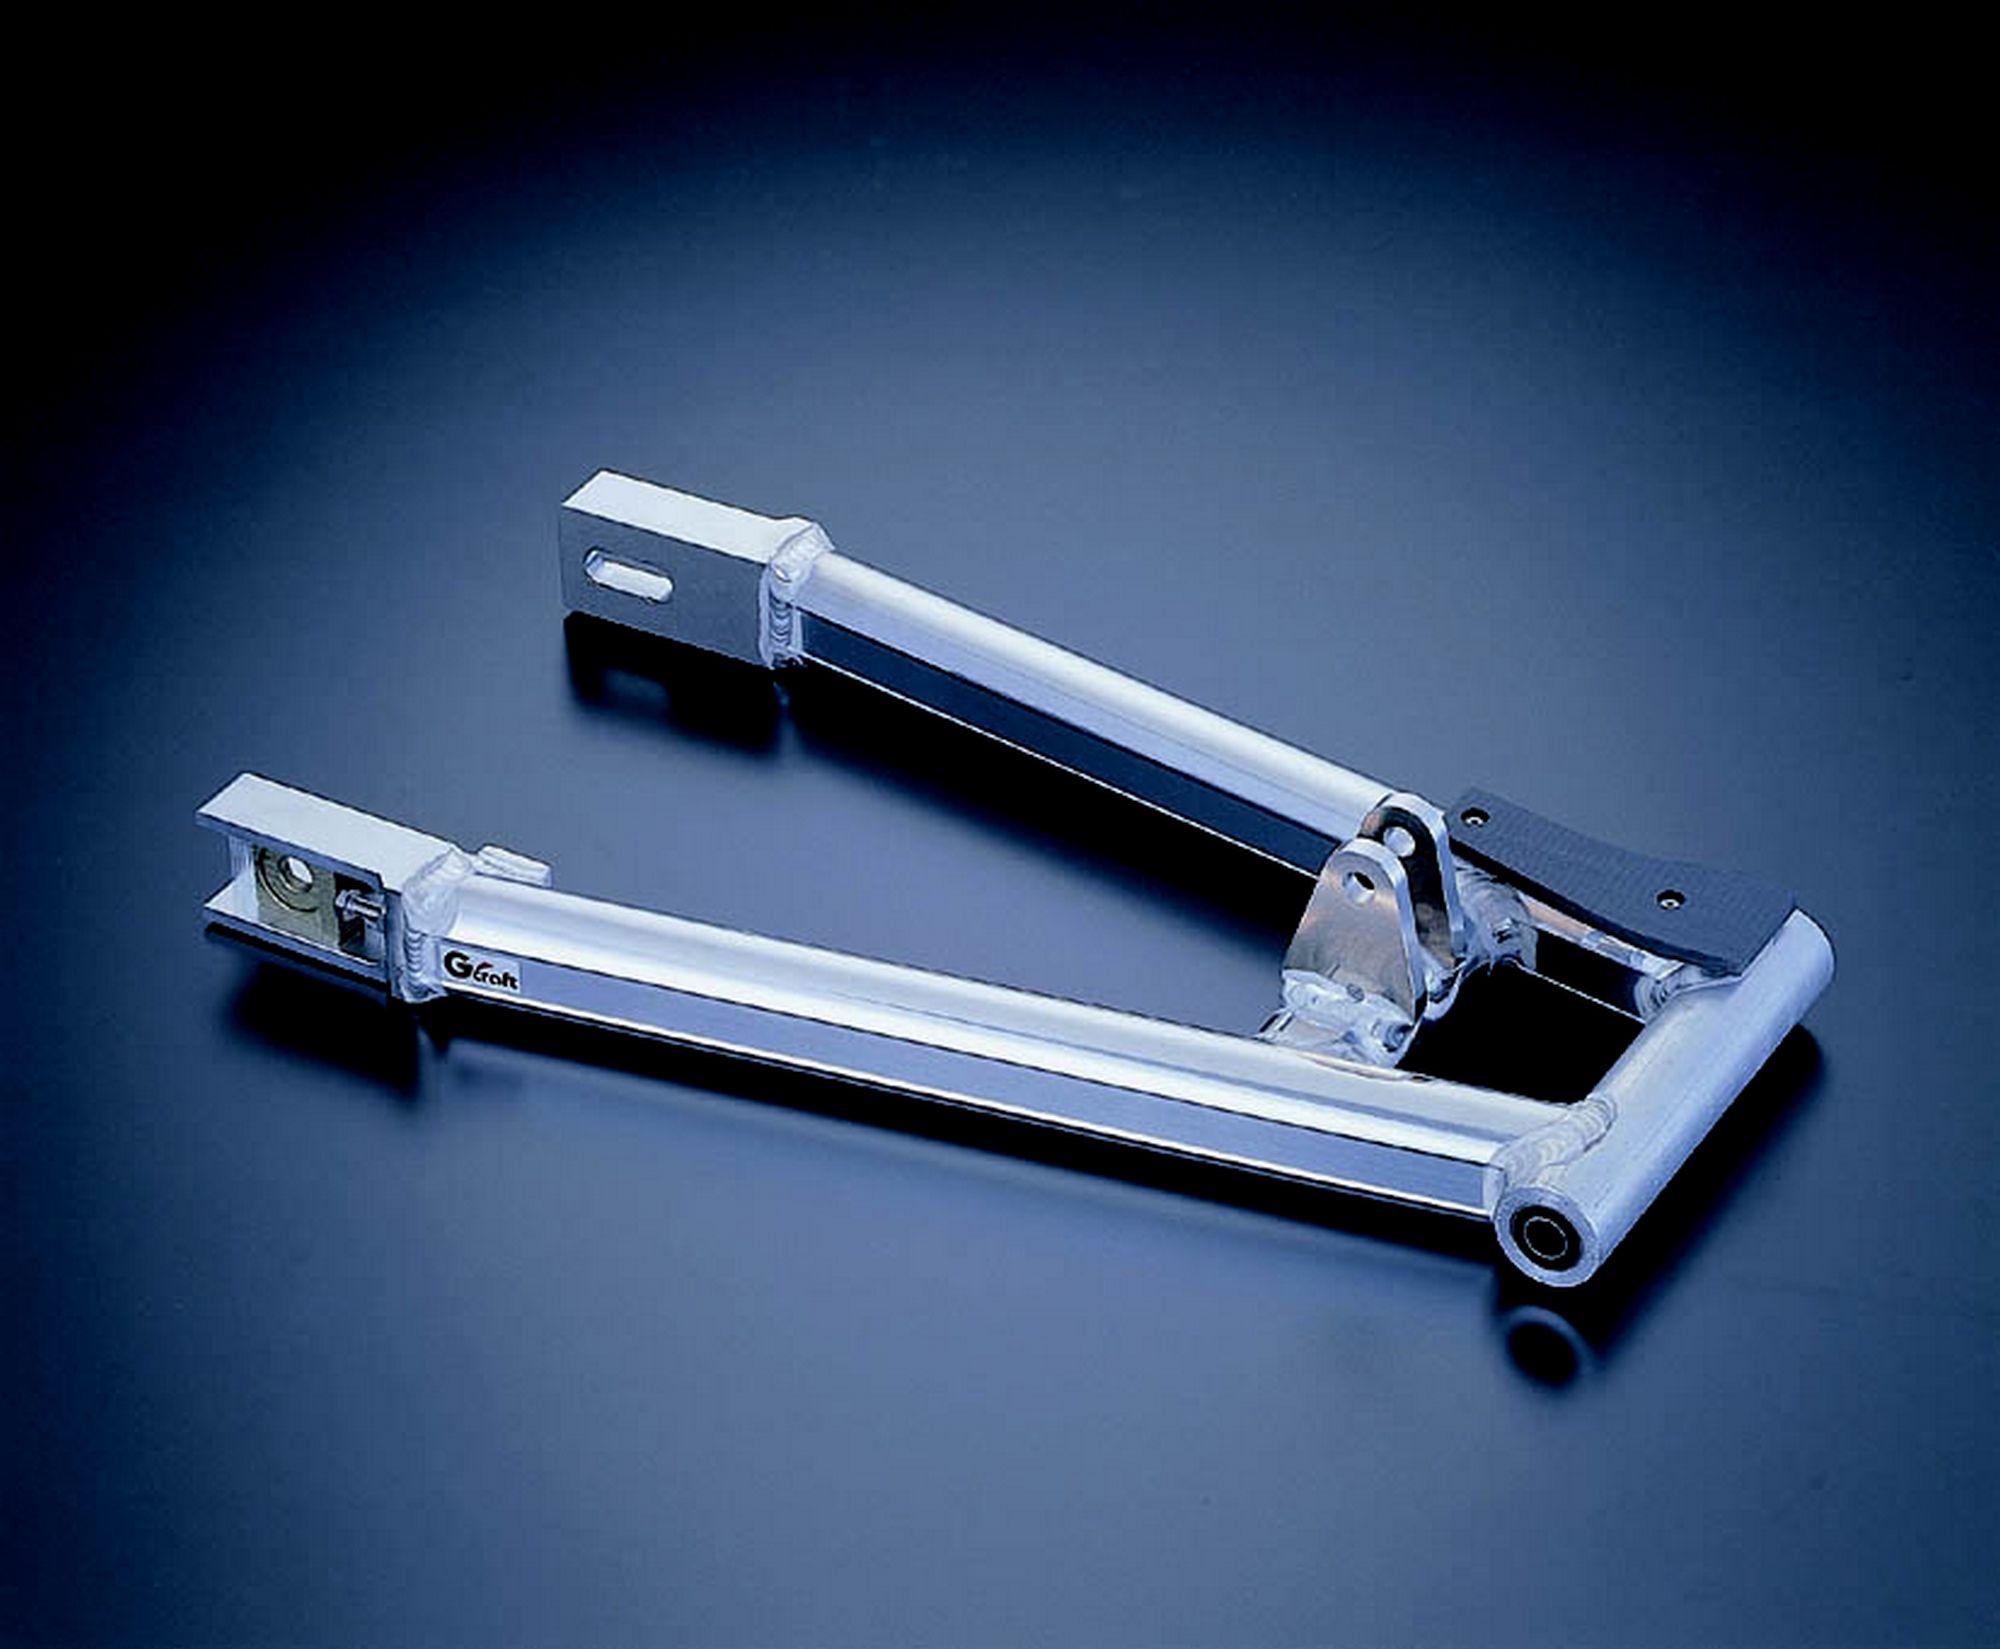 【G-Craft】KSR110專用 MONO SHOCK後搖臂 加長10cm - 「Webike-摩托百貨」